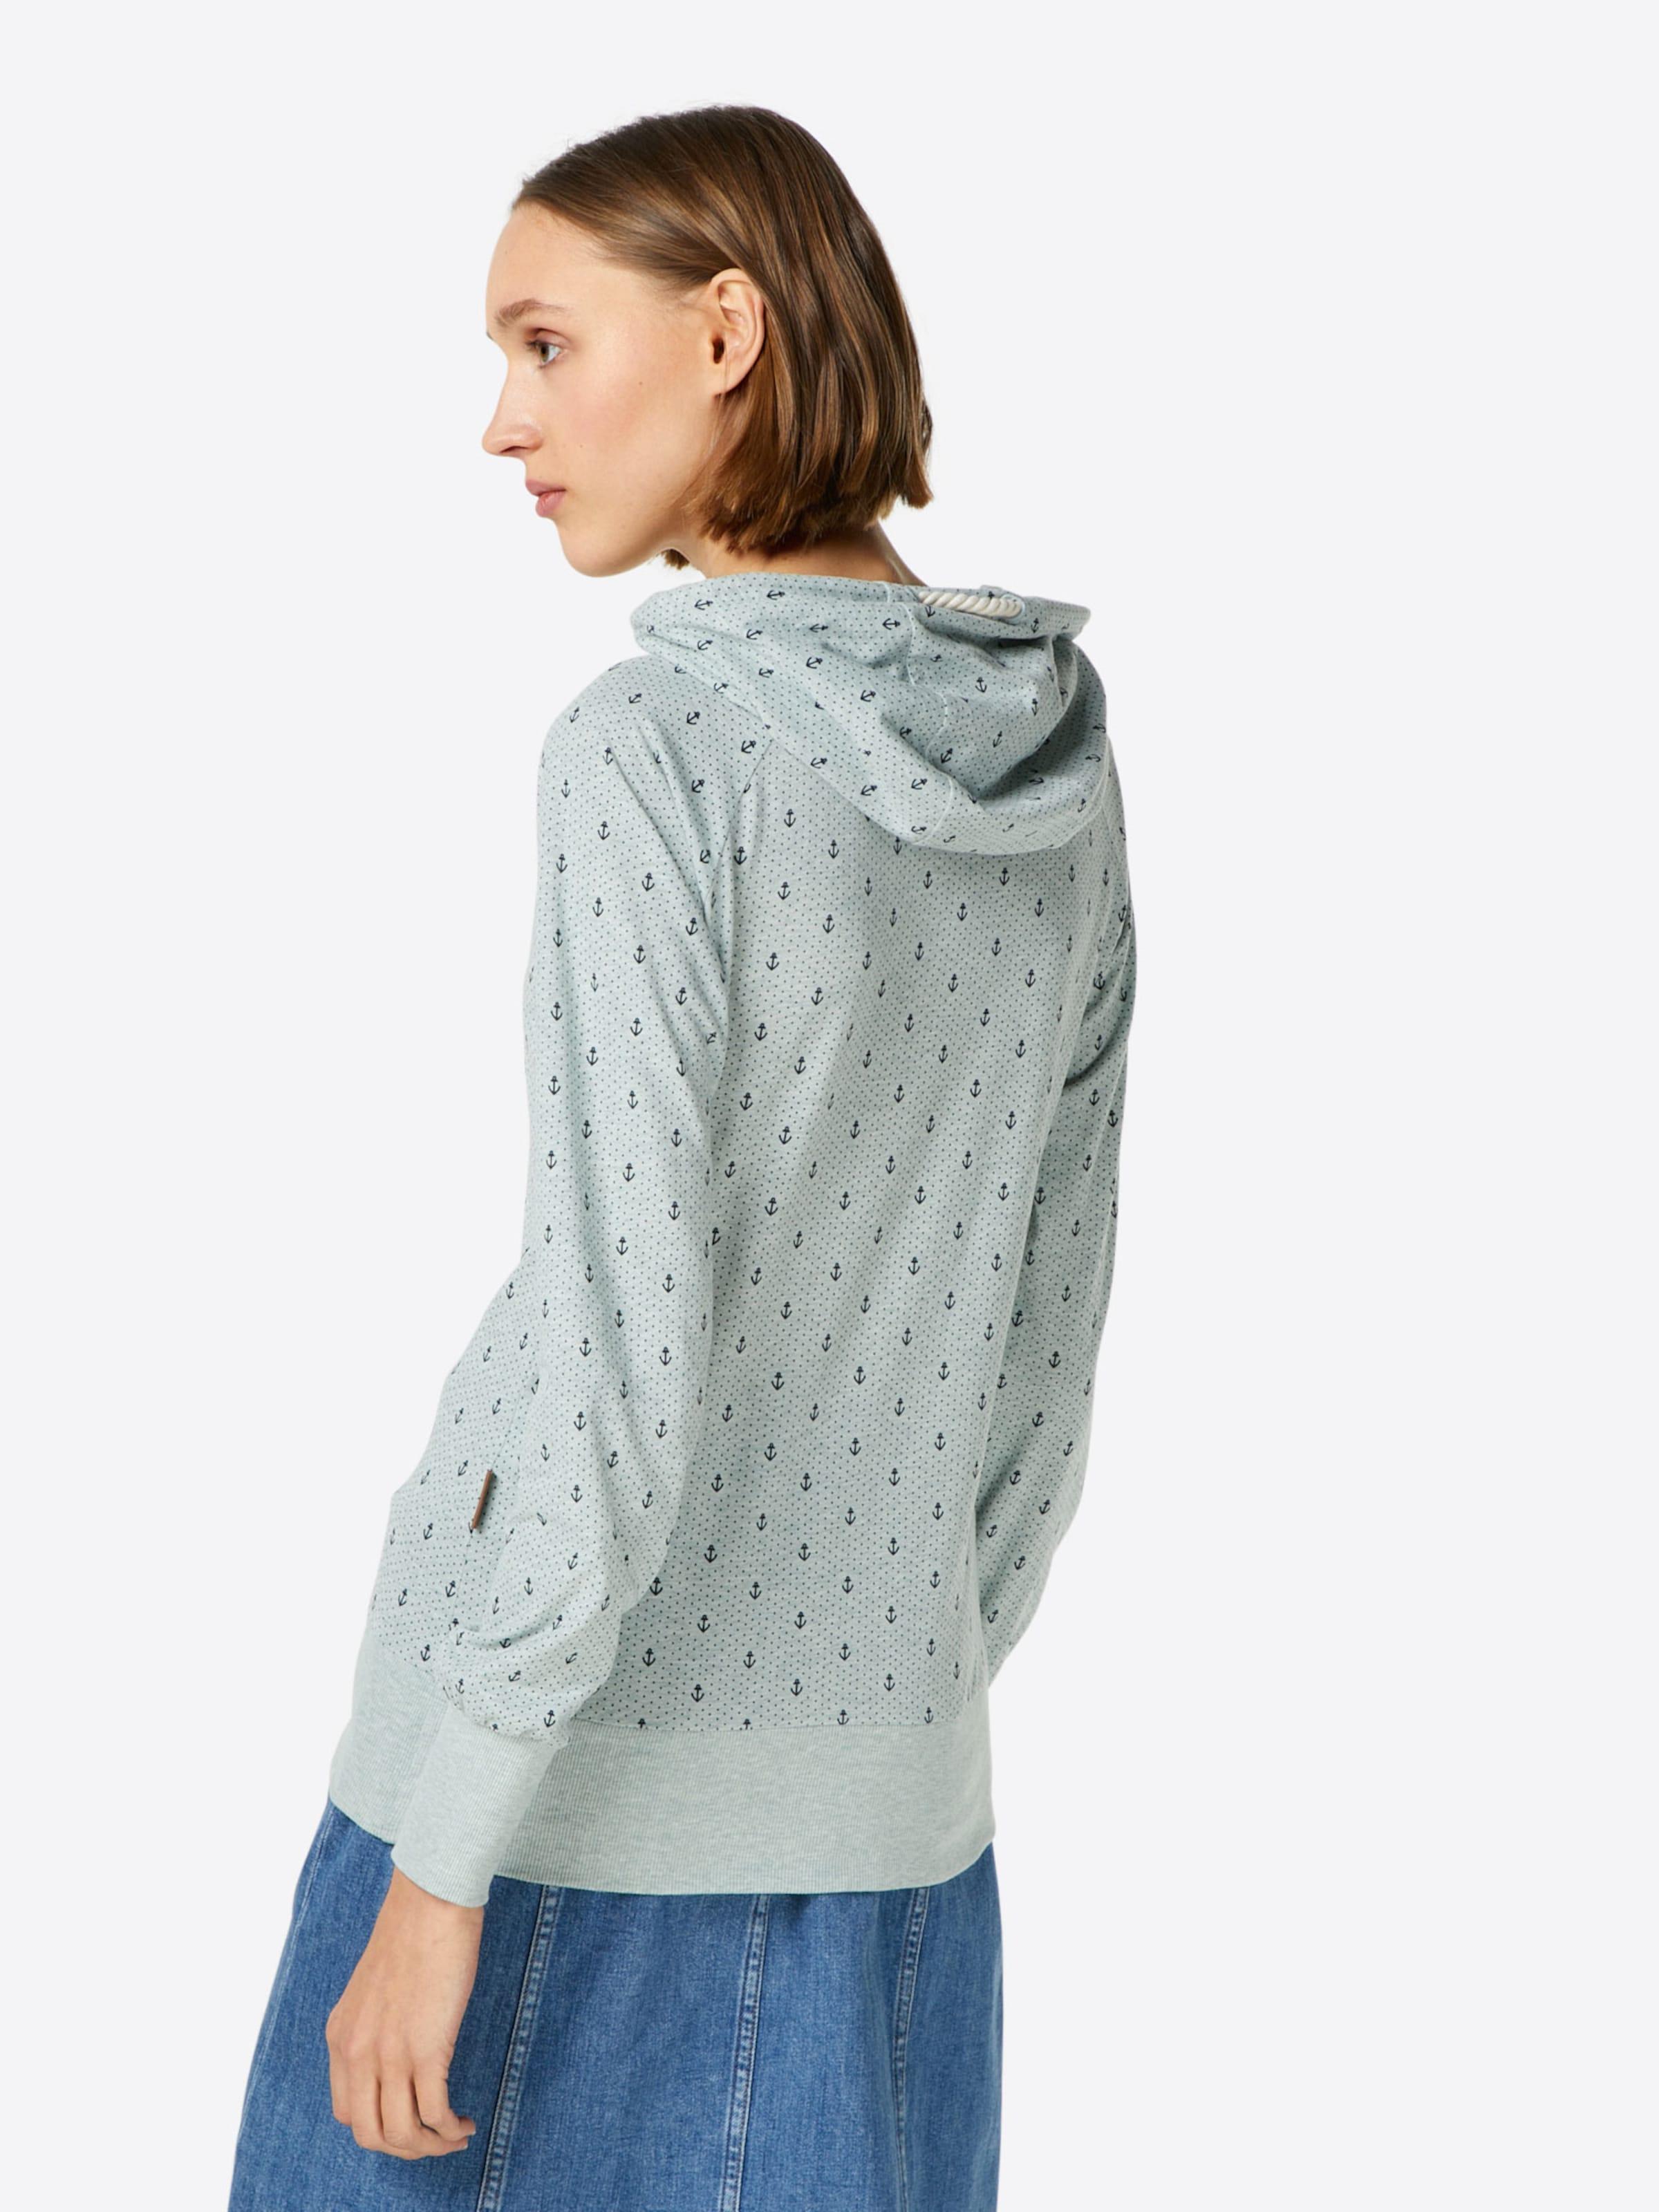 Ankerdizzel' Sweatshirt DunkelblauPastellgrün 'mandy In Naketano vNw80mynO